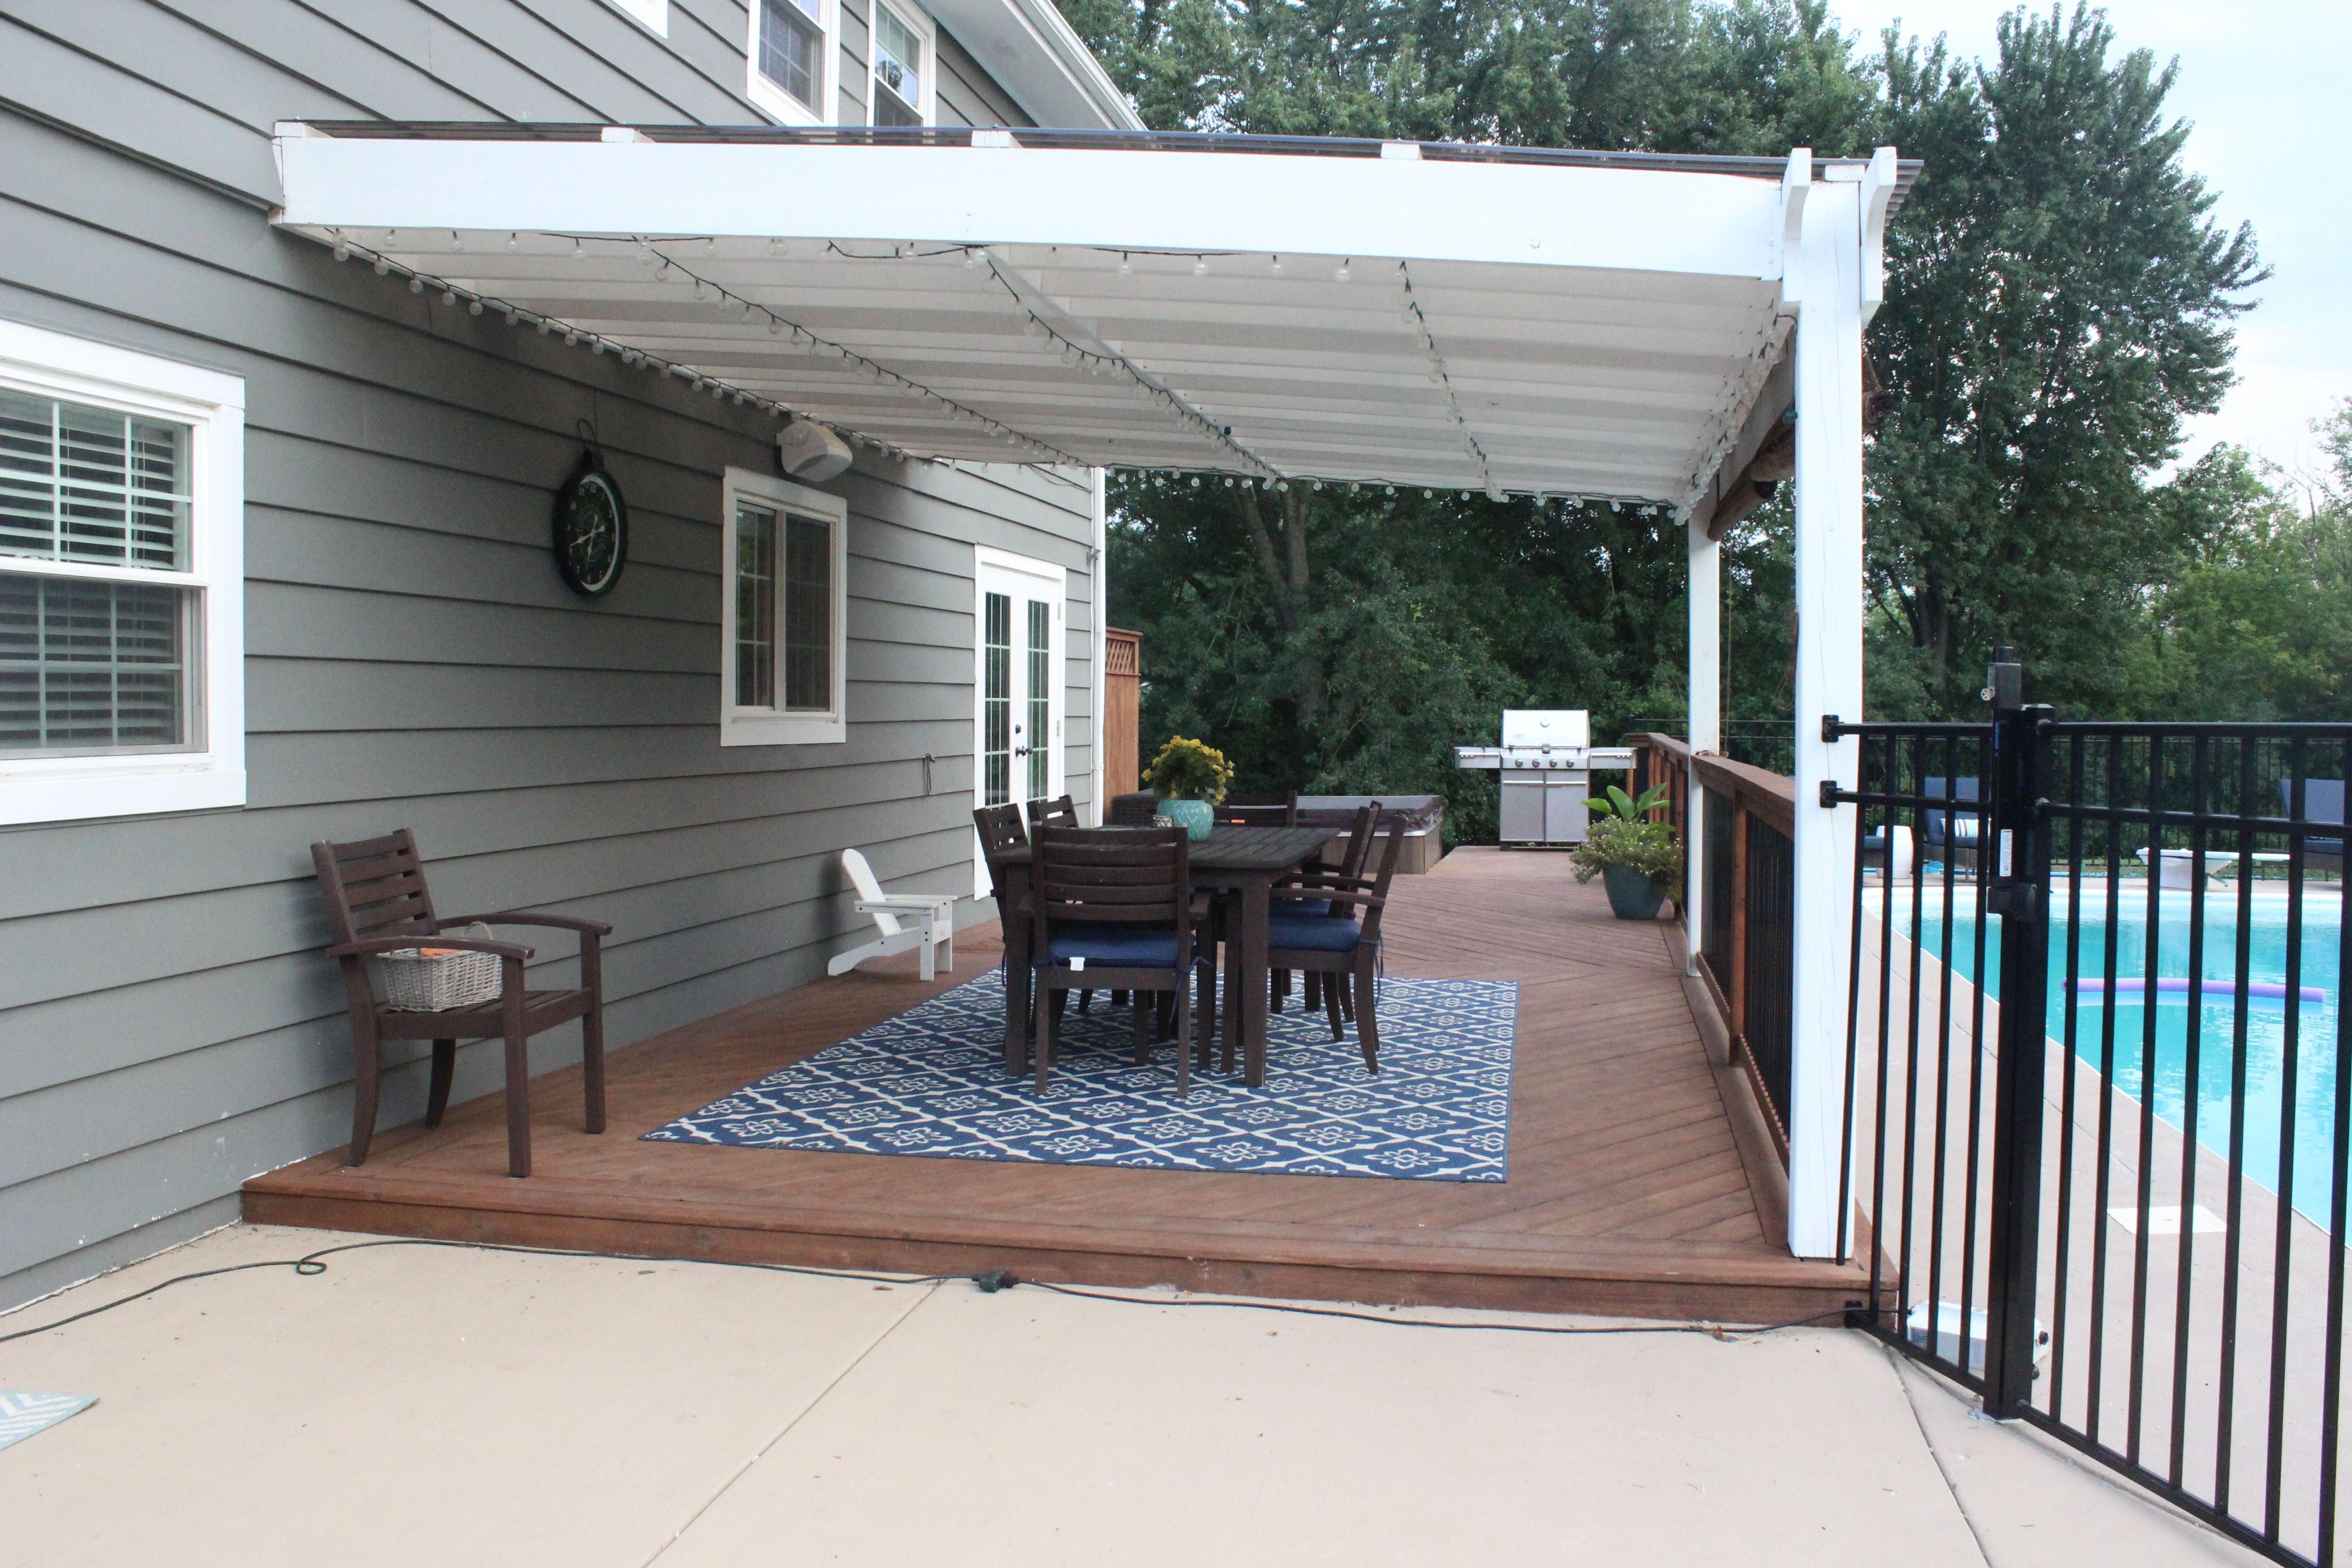 Back Deck And White Pergola For Shade Near Pool House Exterior Big Backyard White Pergola